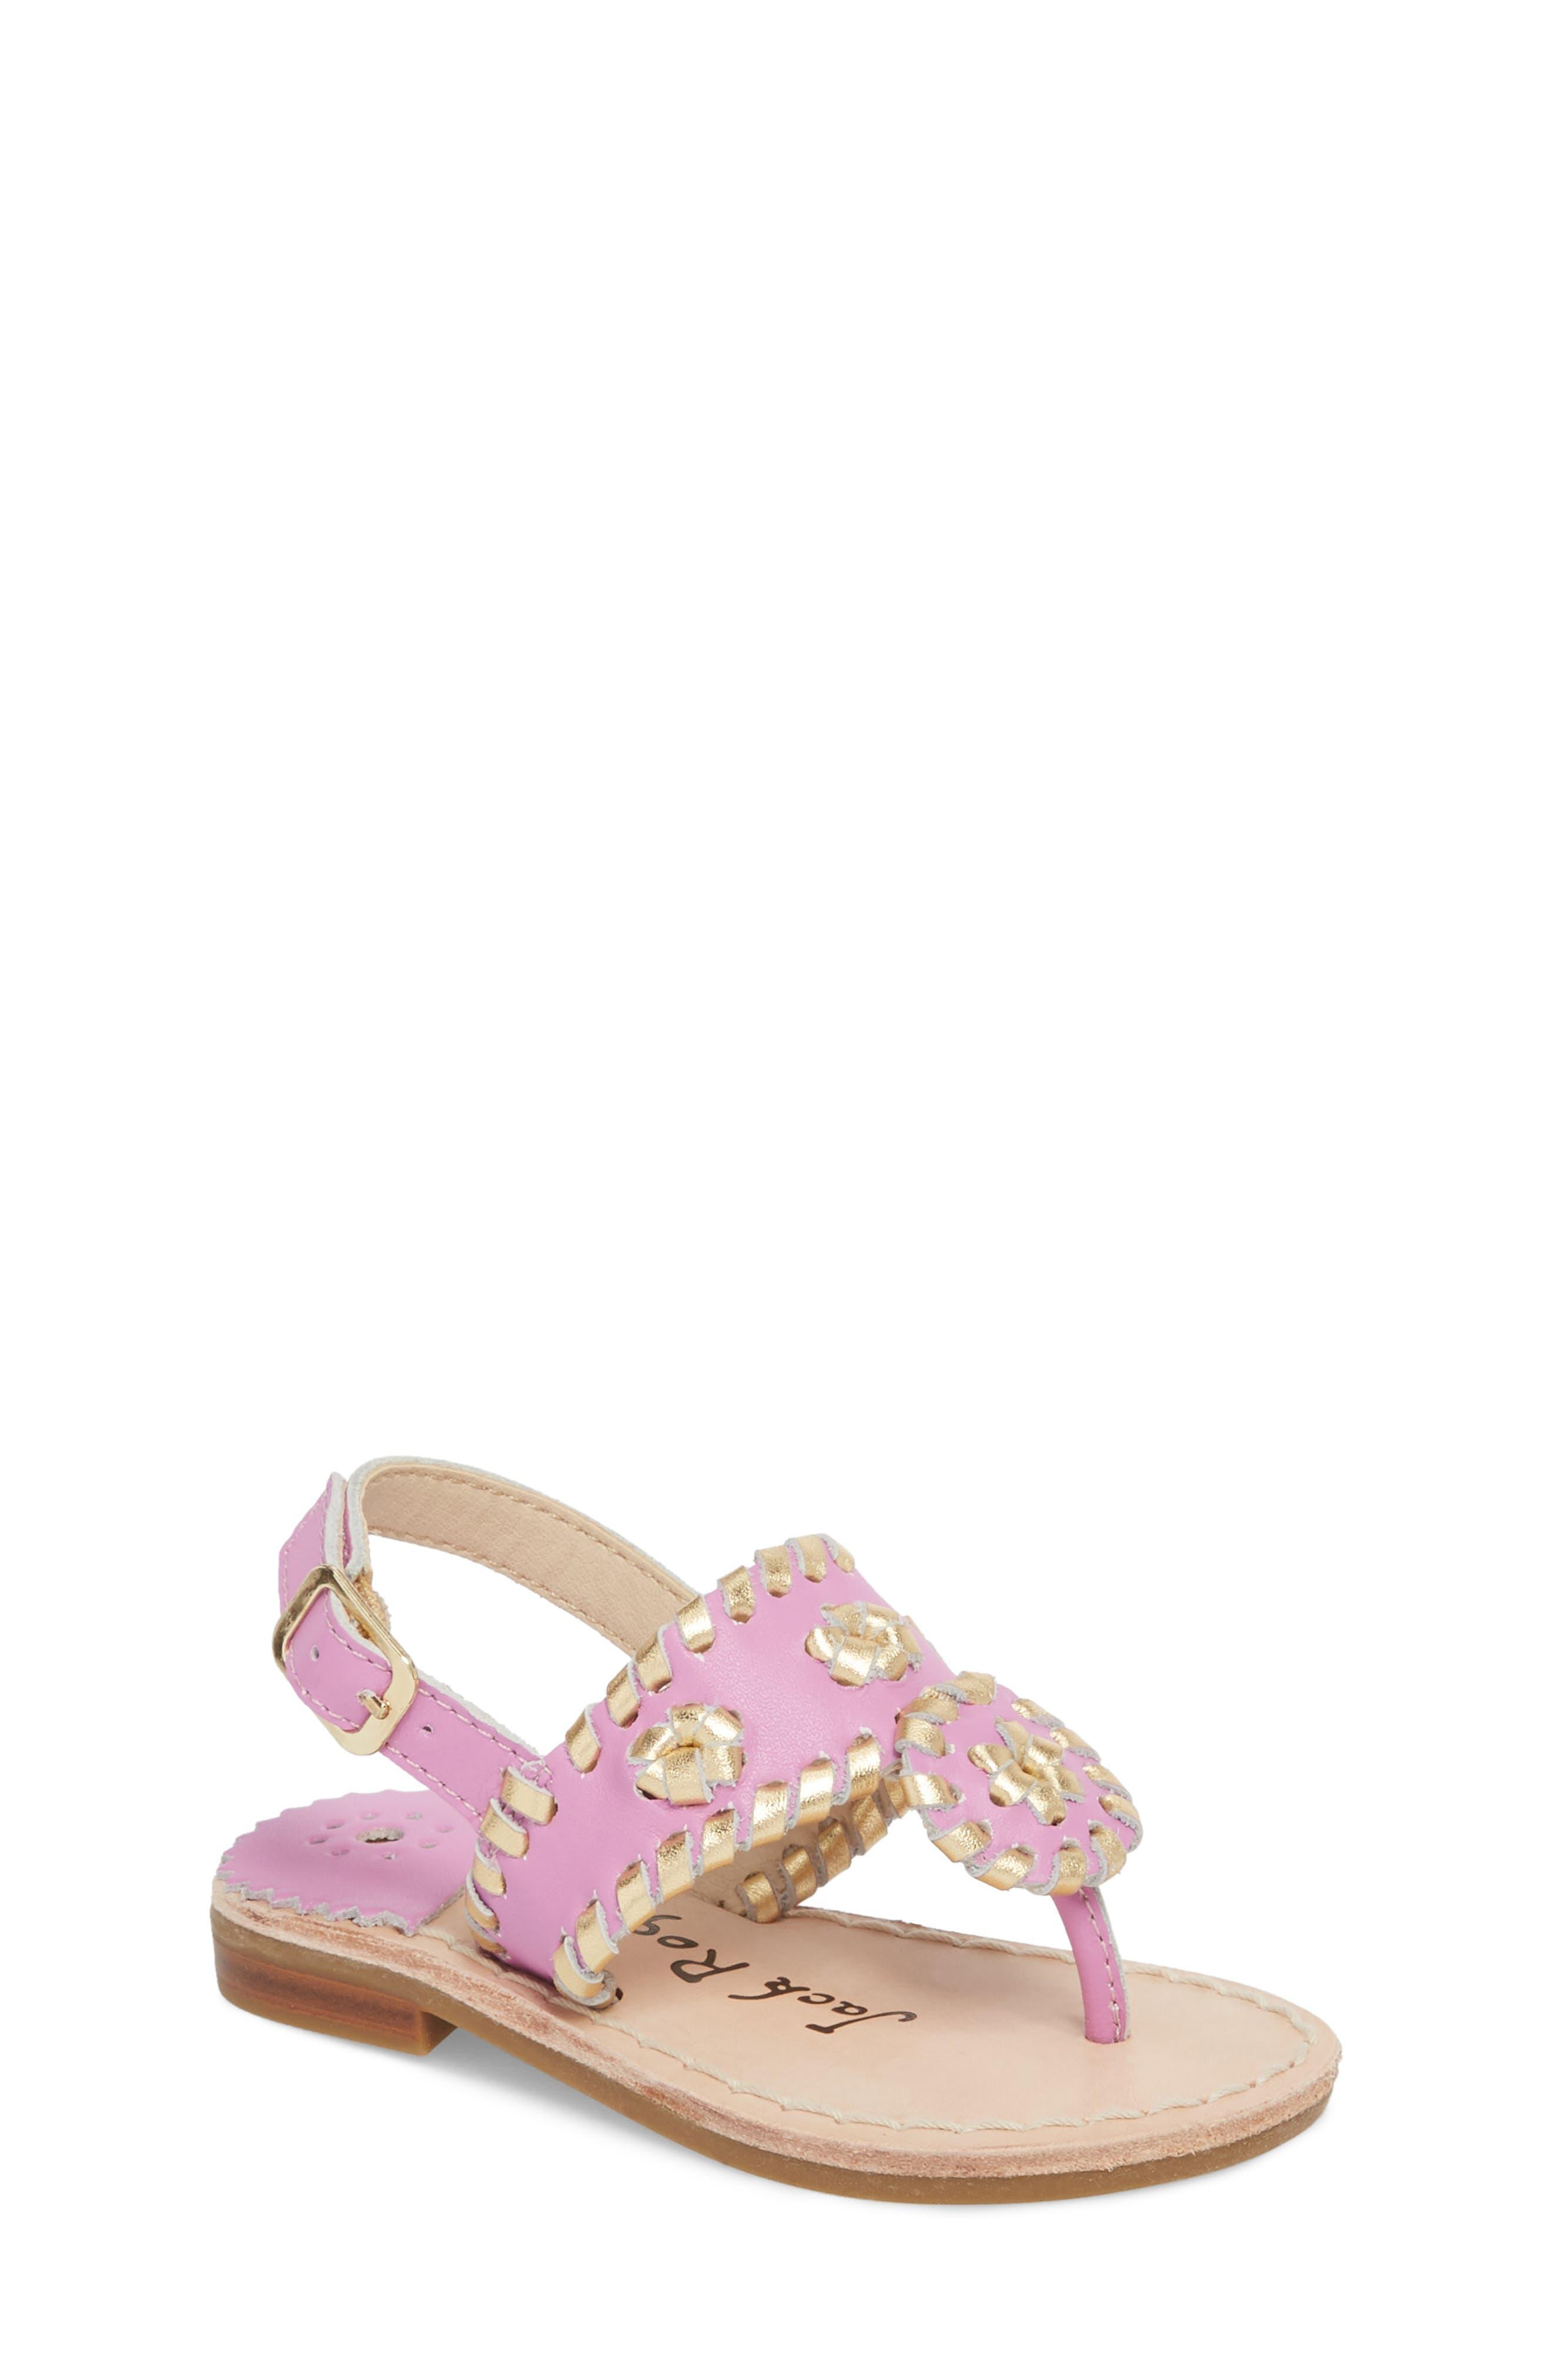 Little Miss Hollis Metallic Trim Sandal,                         Main,                         color, Lavender Pink/ Gold Leather